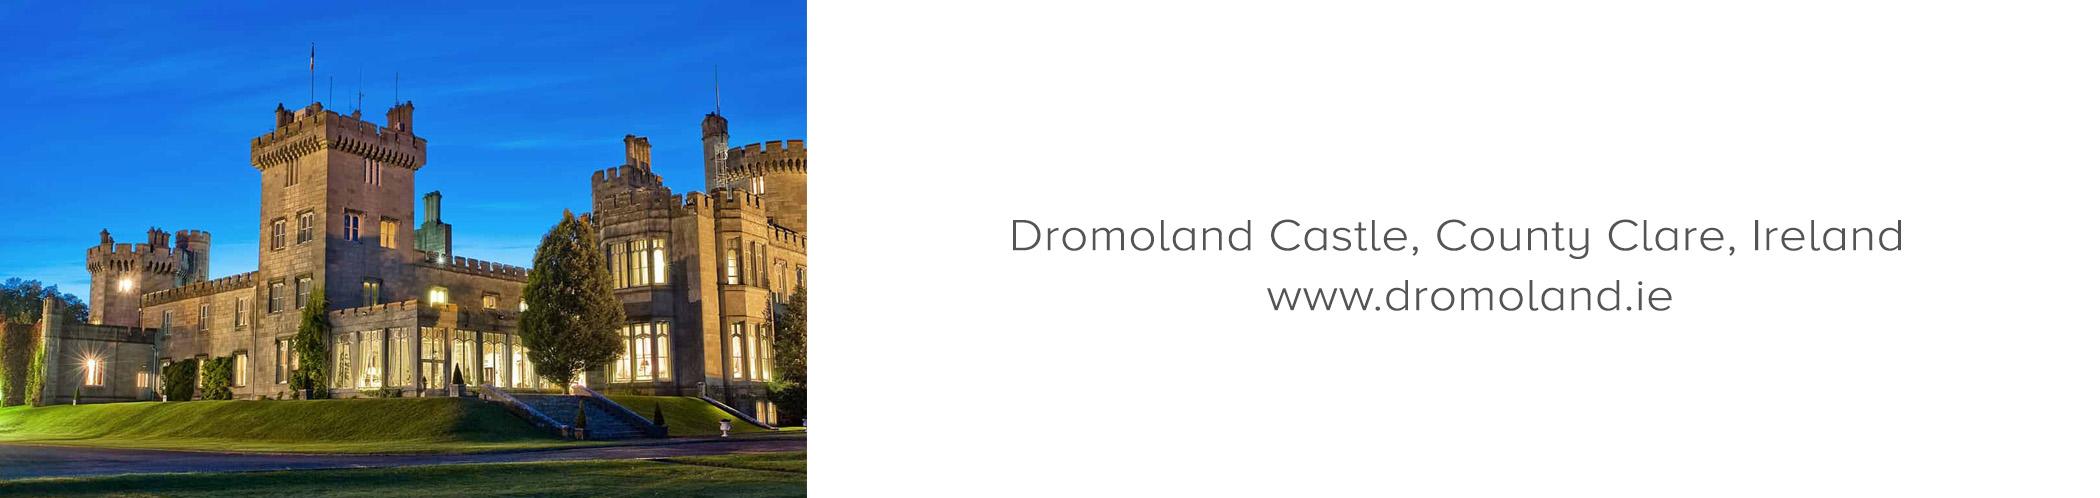 www.dromoland.ie.jpg